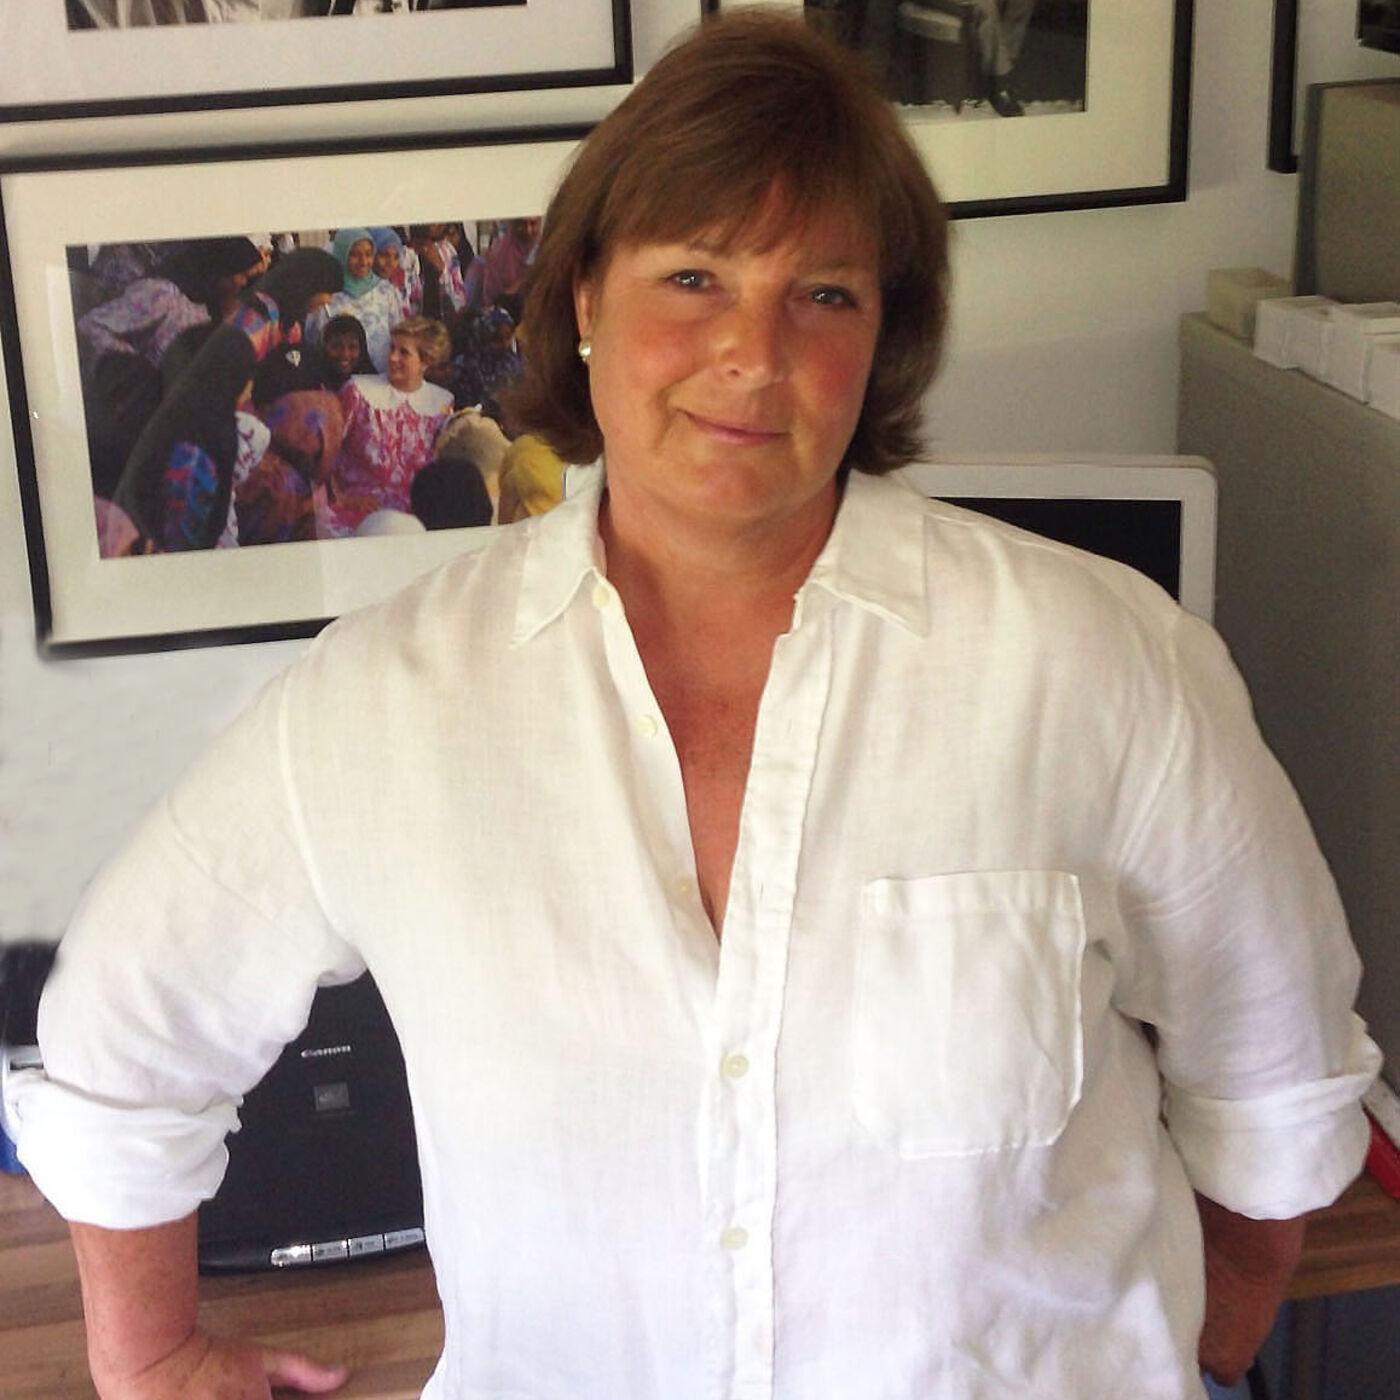 Princess Diana Museum - Jayne Fincher, Photojournalist